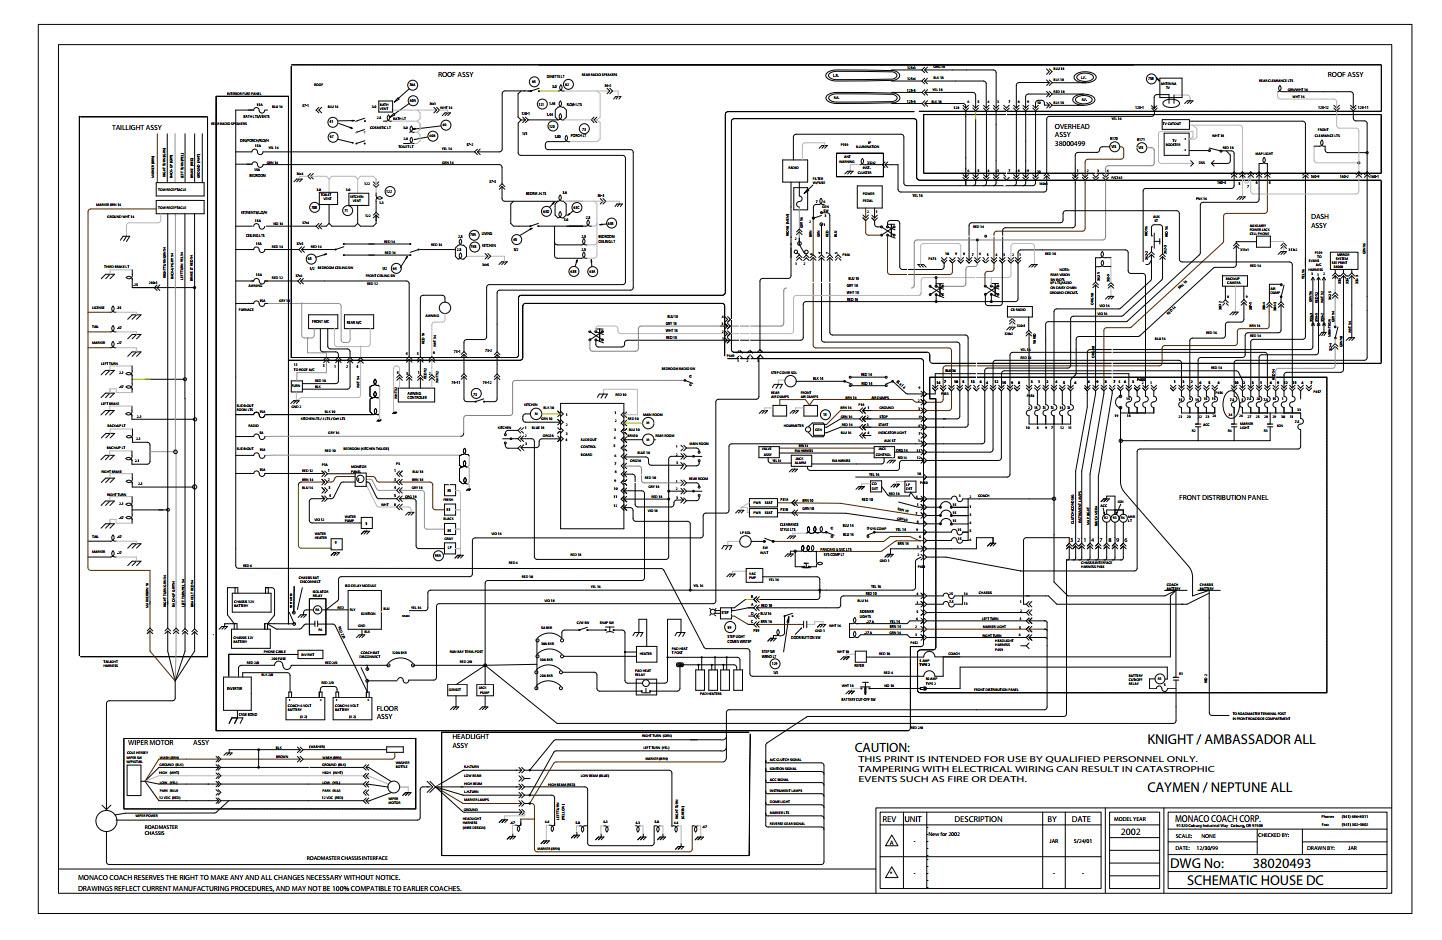 809 Meyer Plow Wiring Diagram Rc 91b | Wiring LibraryWiring Library